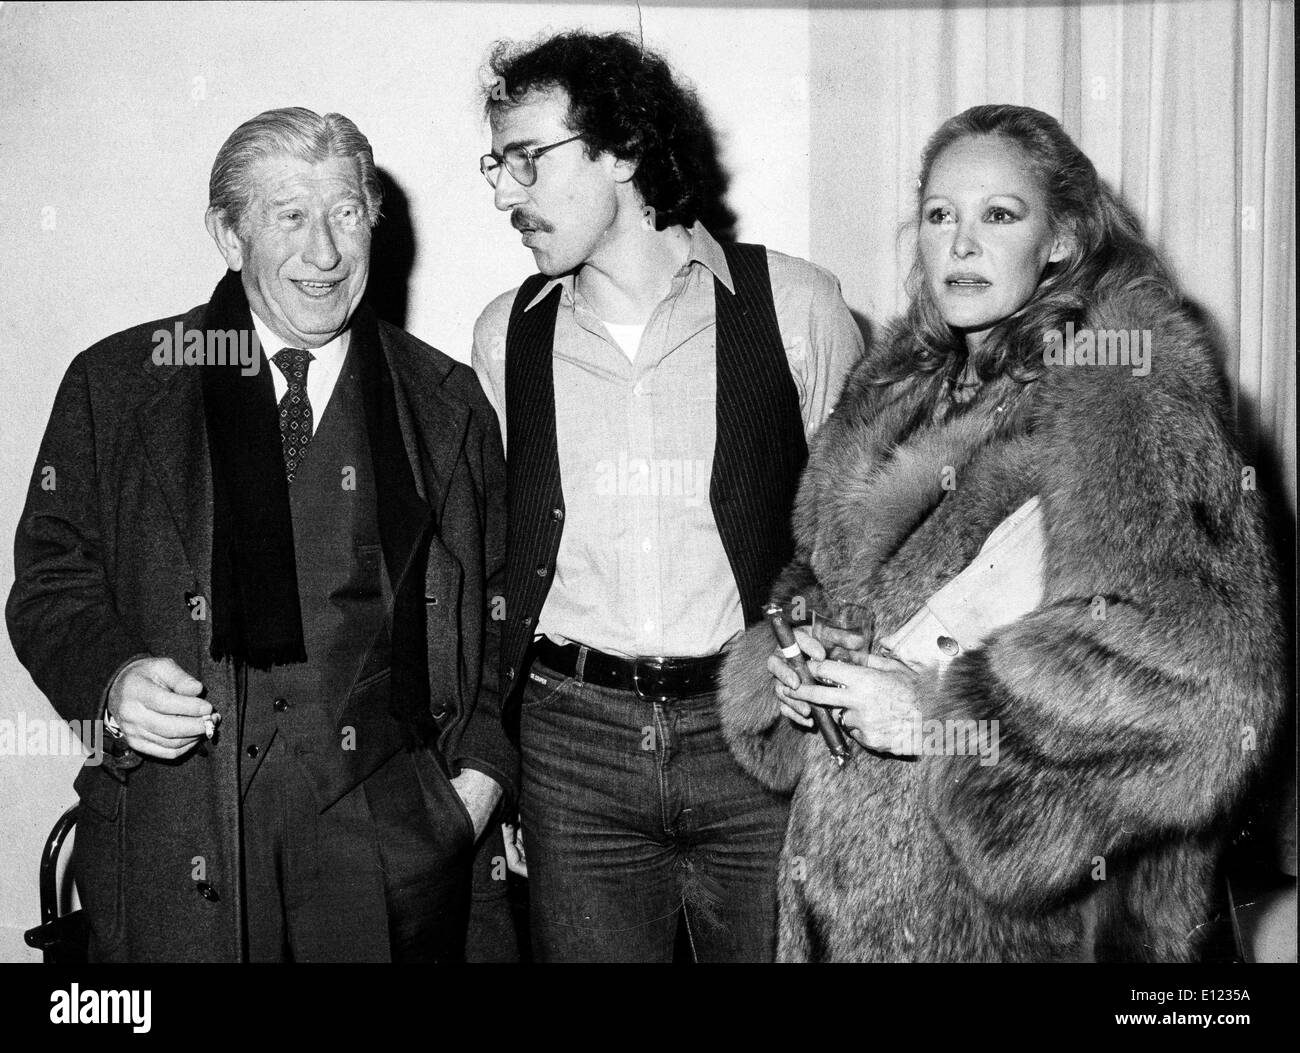 Jan. 01, 1984 - File Photo: circa 1970s-1980s, location unknown. Perfume maker ZINO DAVIDOFF with URSULA ANDR - Stock Image